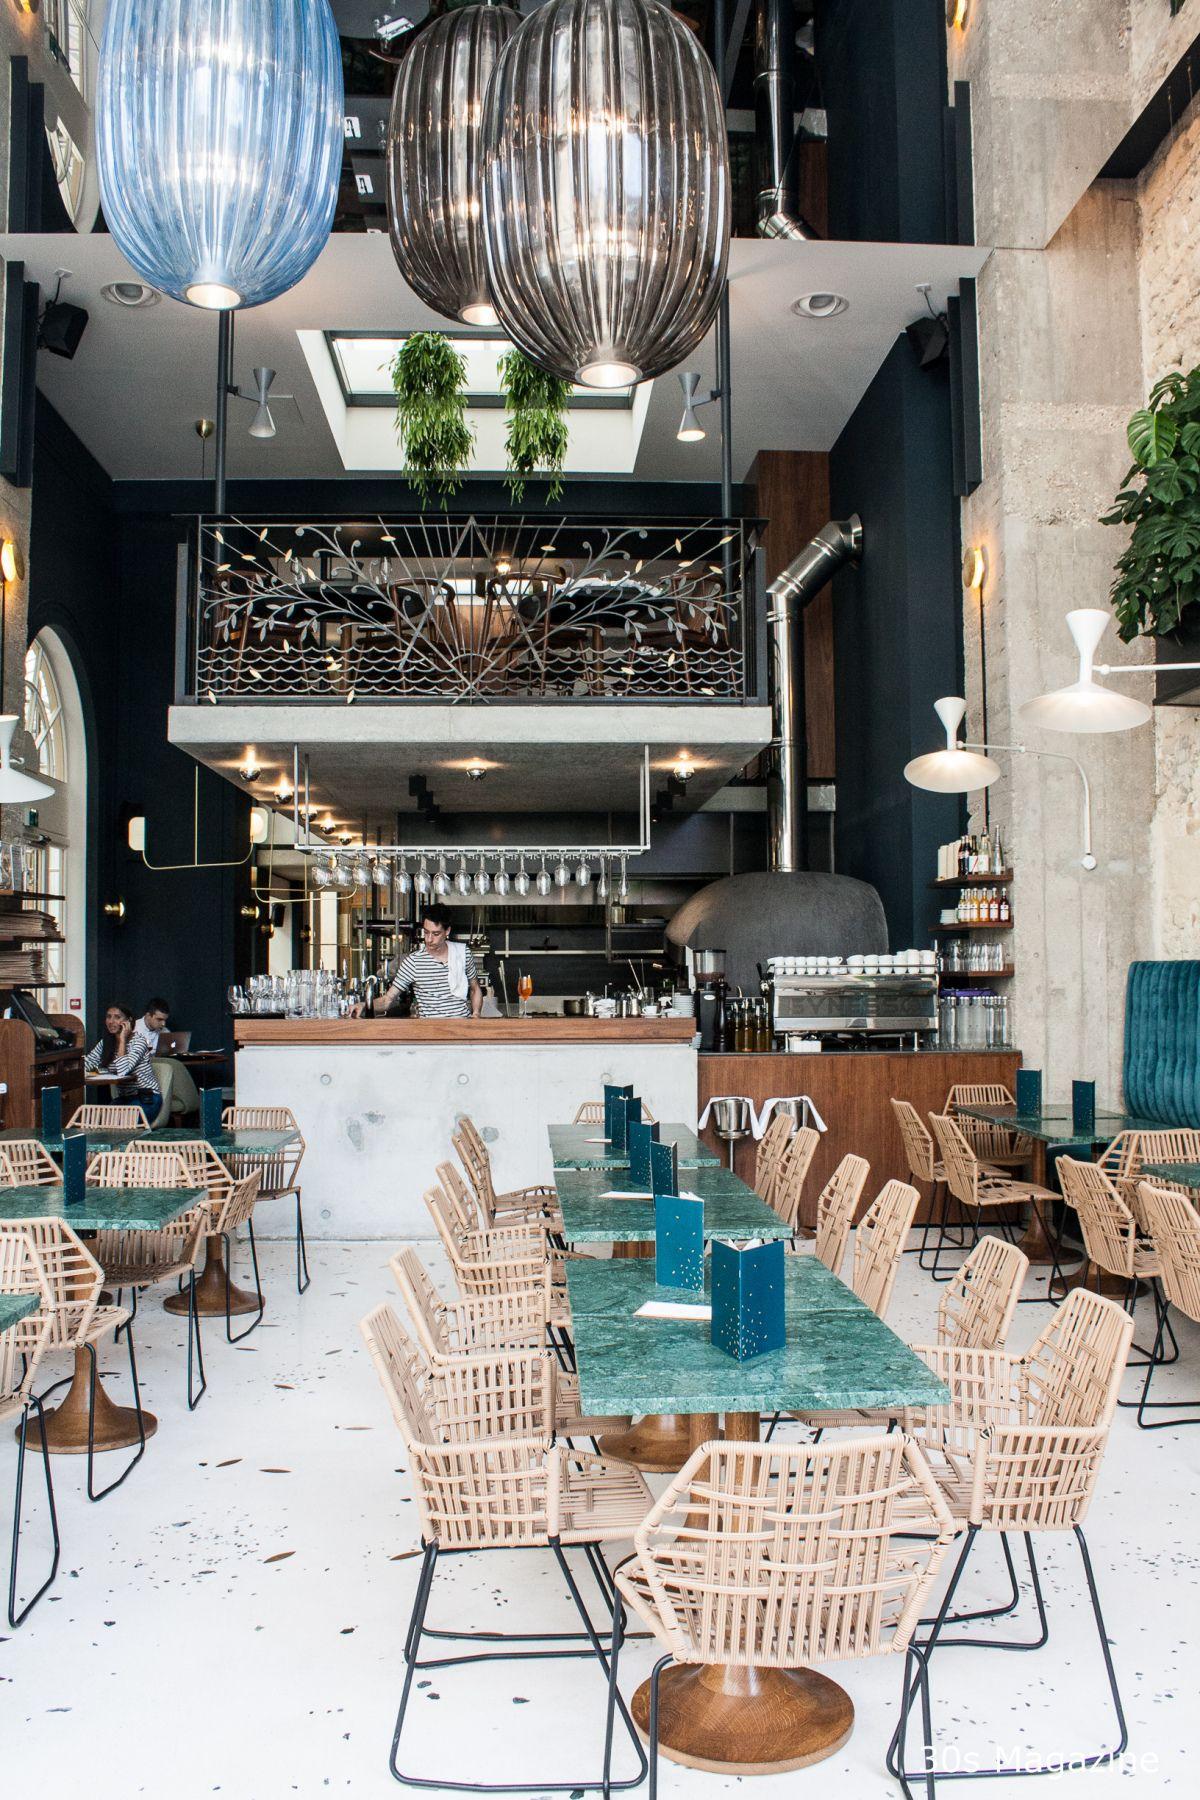 Daroco Paris   Café   restaurant design in 2018   Restaurante ... abb2fbc8159a